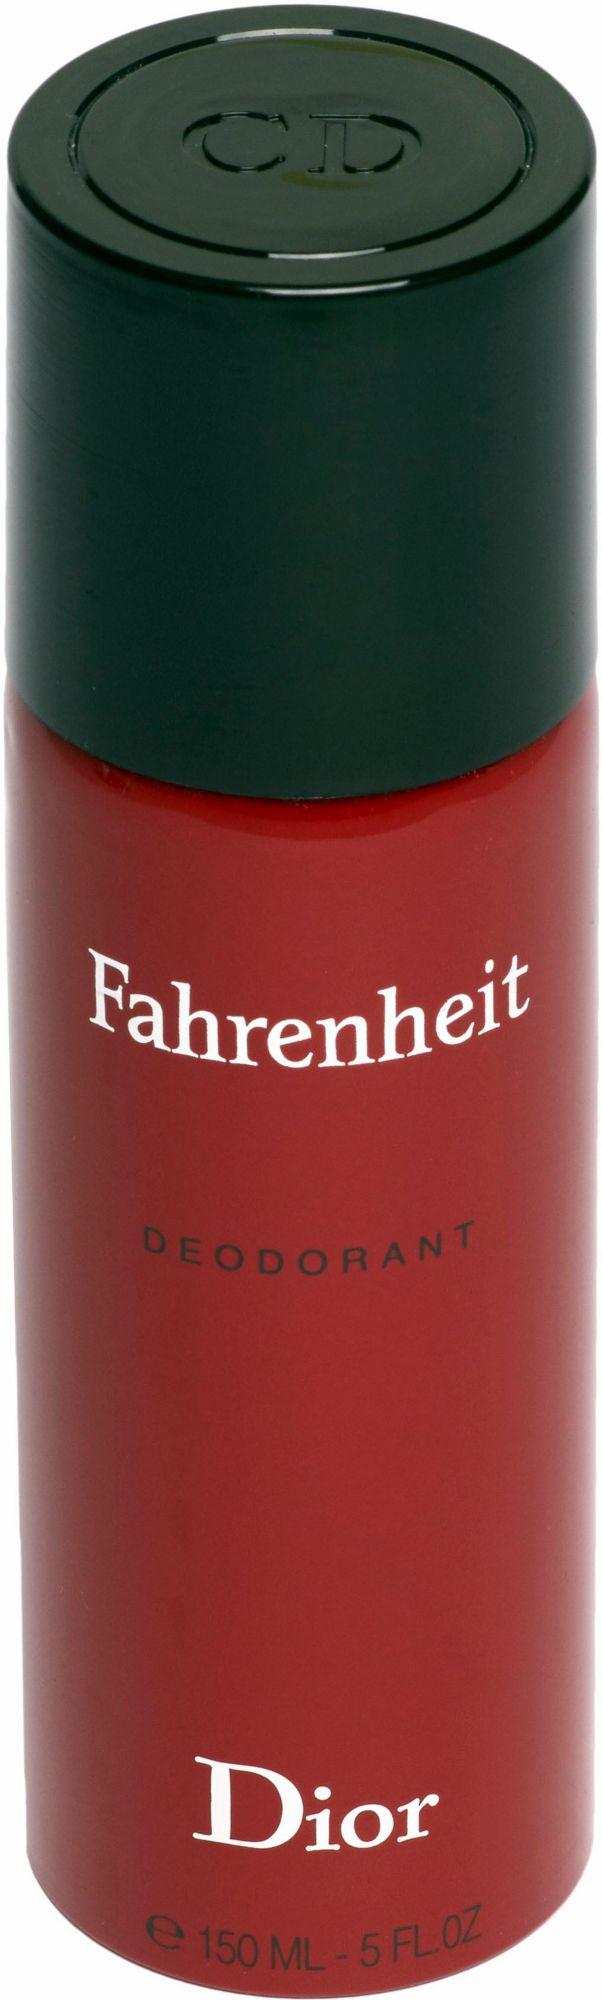 DIOR Dior, »Fahrenheit«, Deodorant